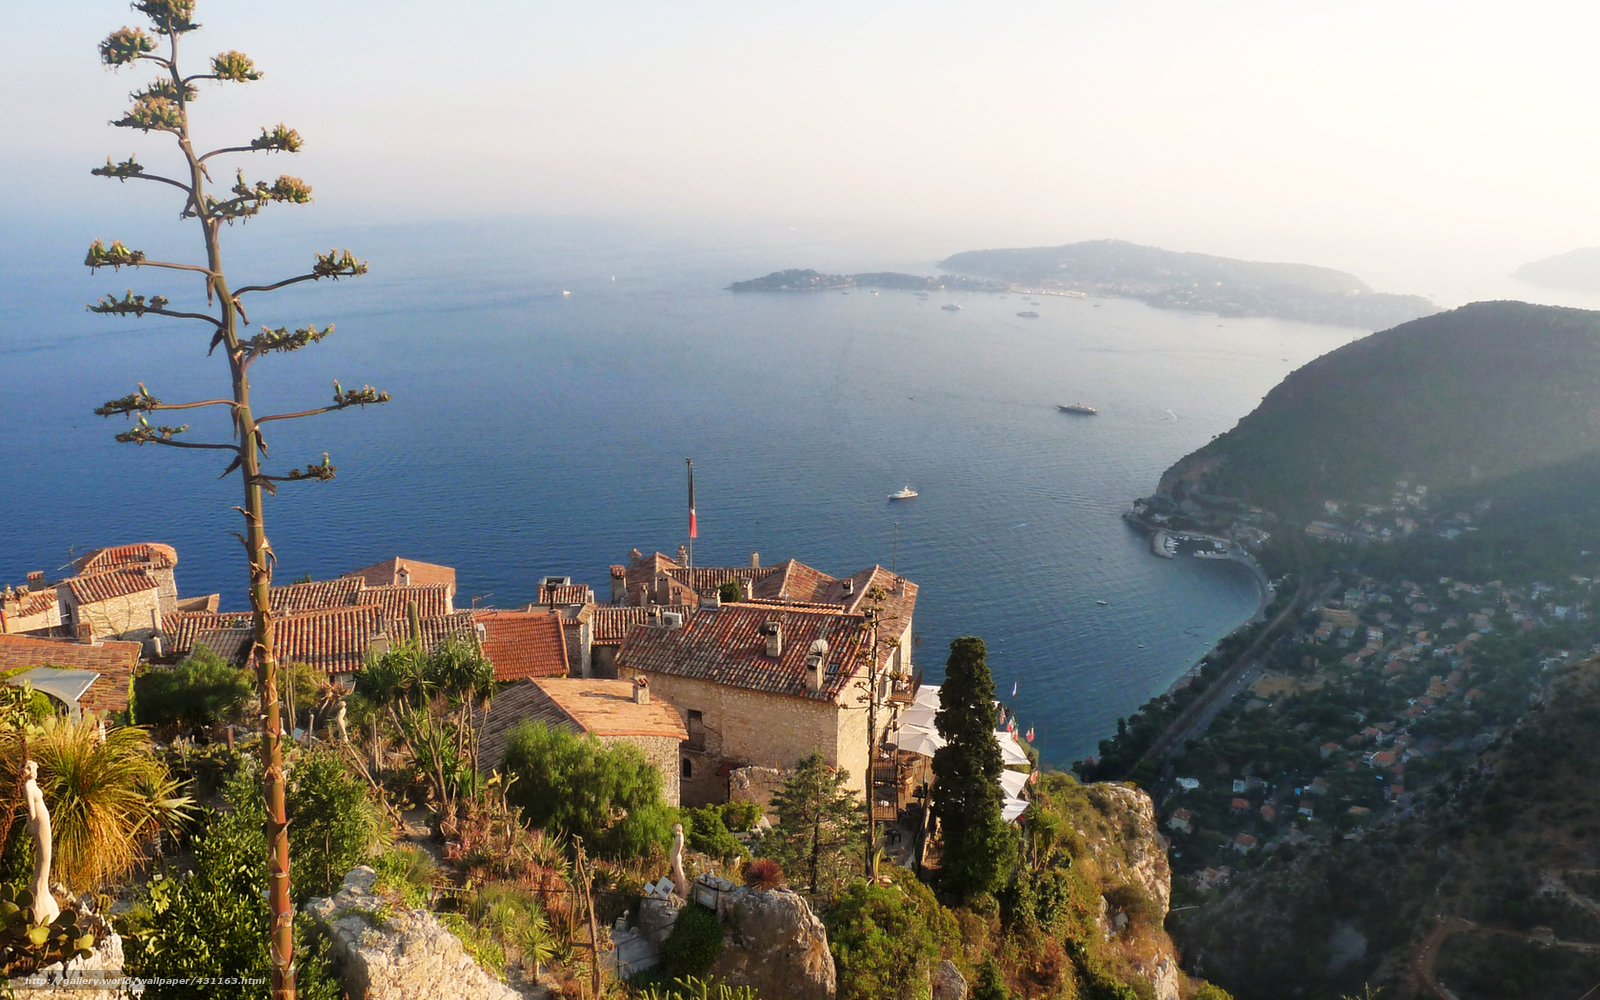 Free Download Wallpaper Cote Dazur French Riviera France Sea